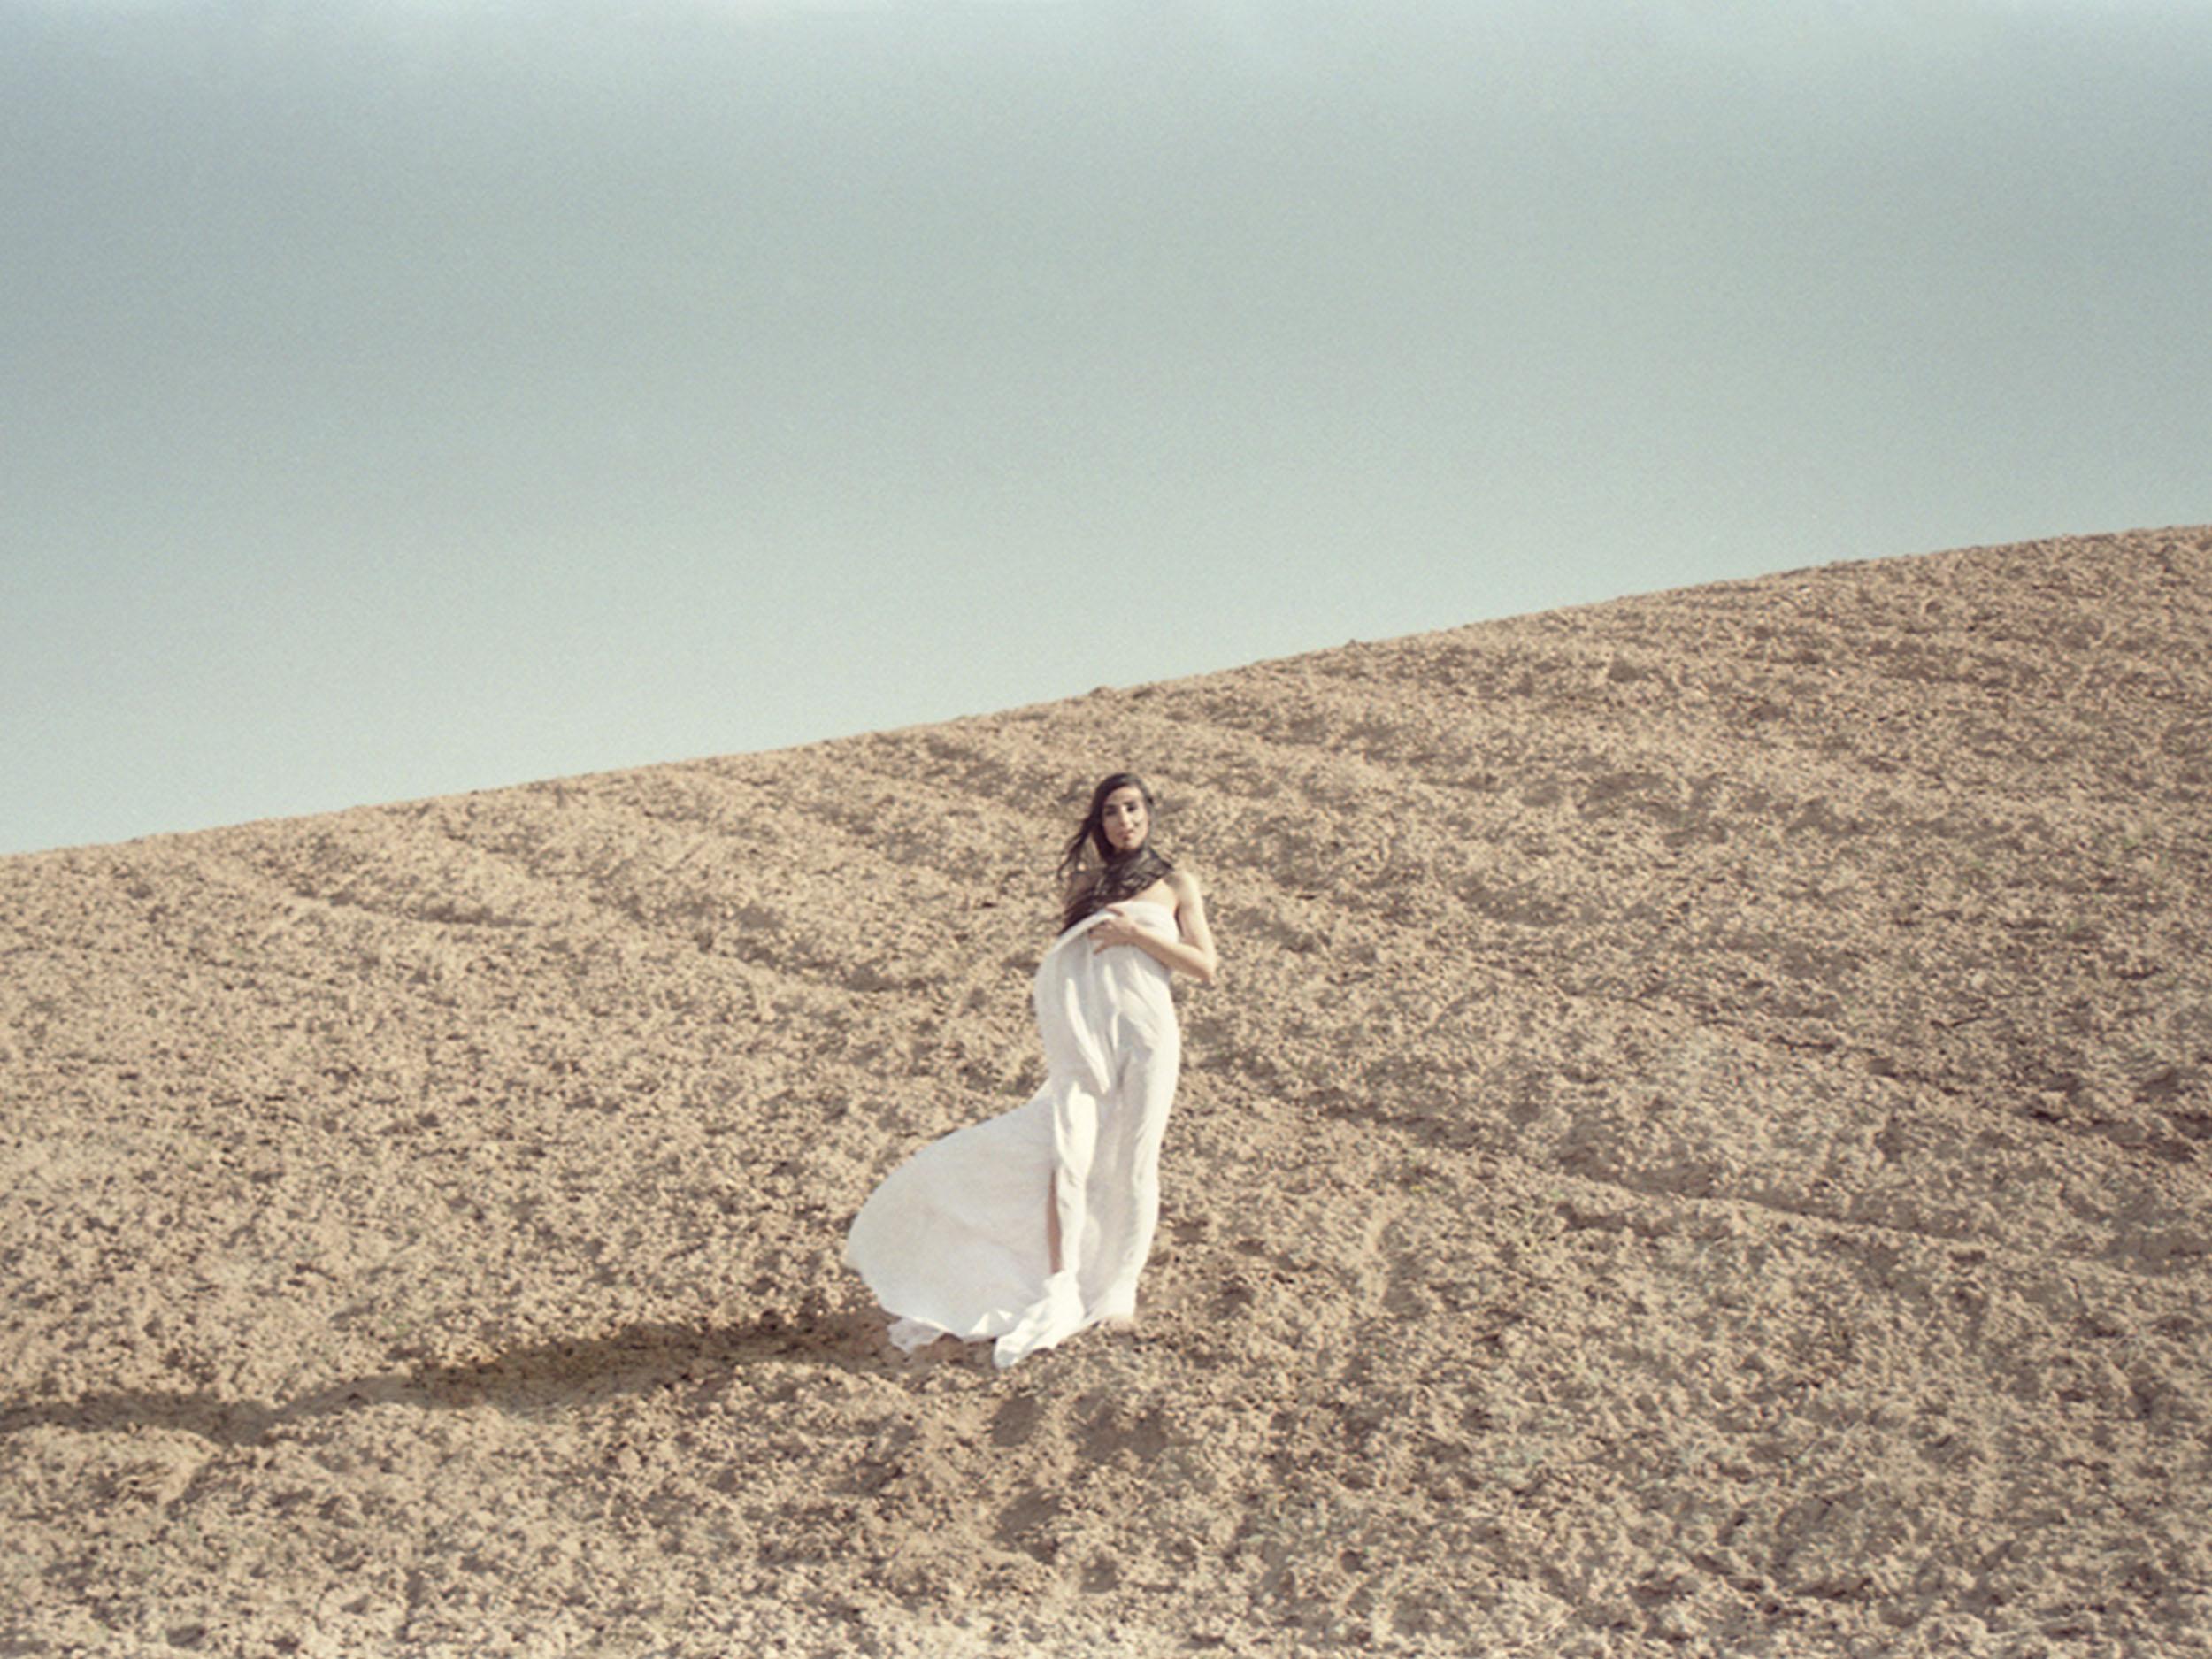 Photographer Sedirea takes us on an intimate journey across the Iranian desert